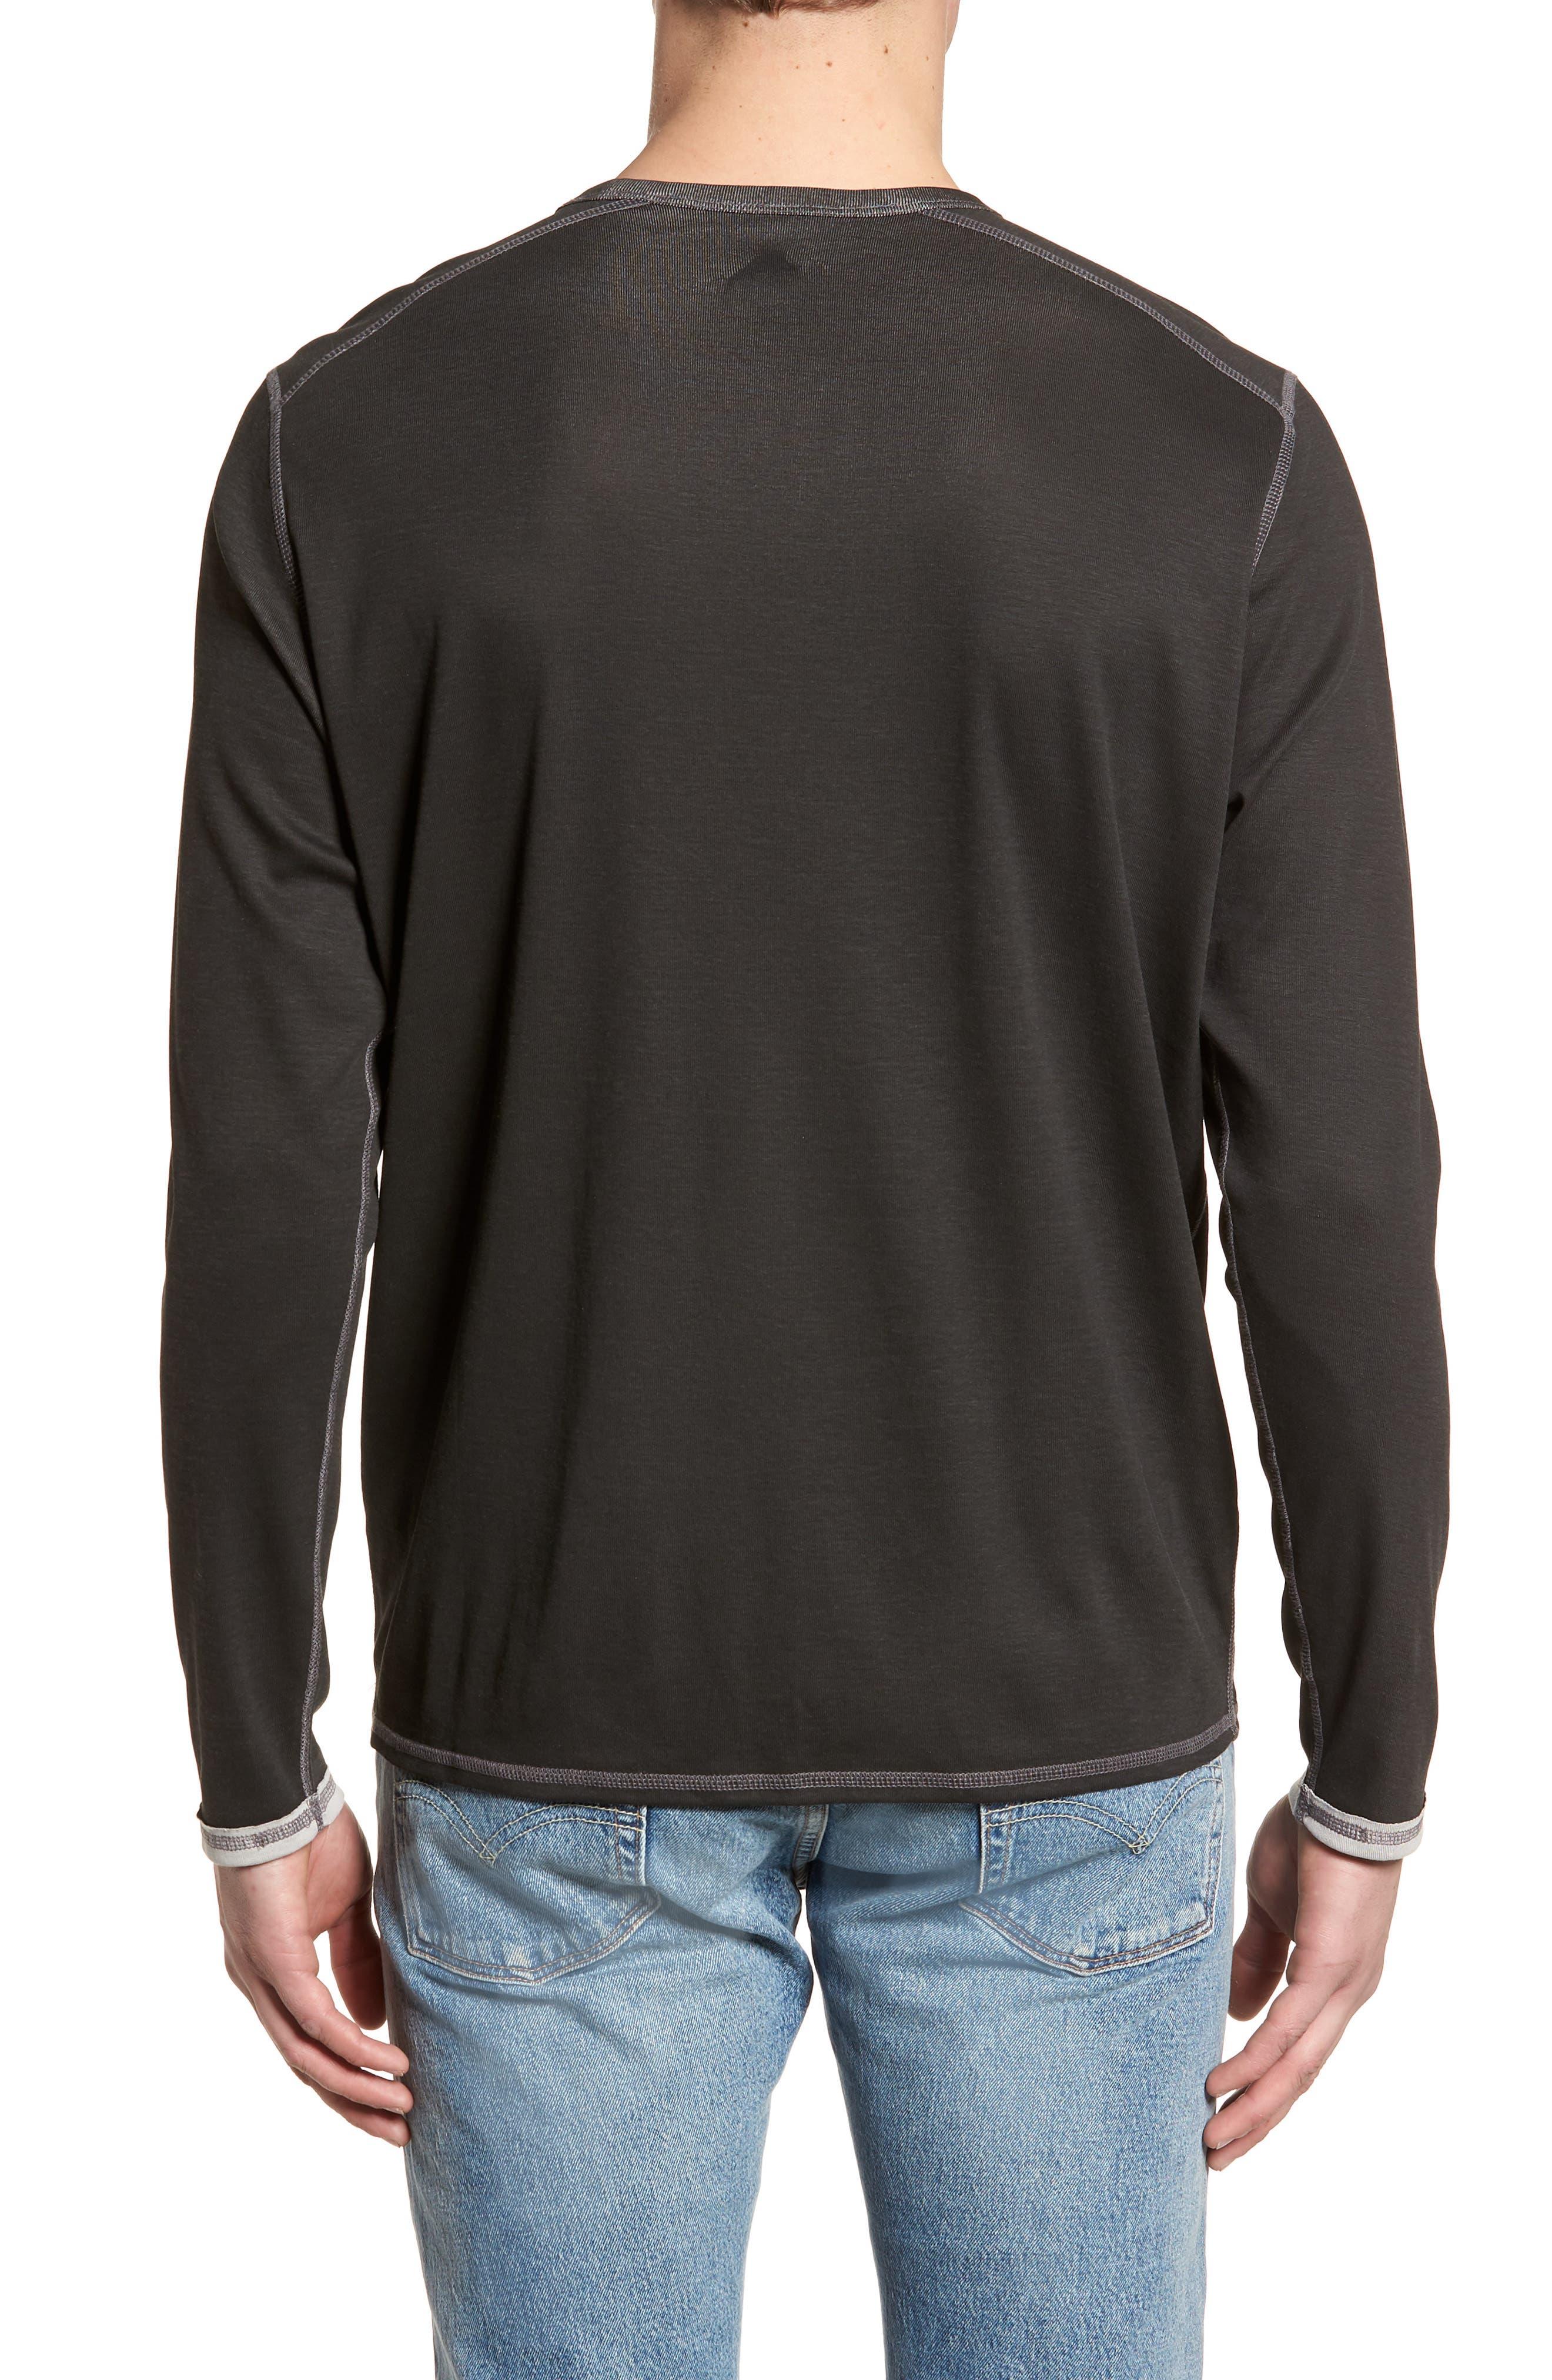 Dual in the Sun Reversible T-Shirt,                             Alternate thumbnail 2, color,                             Black